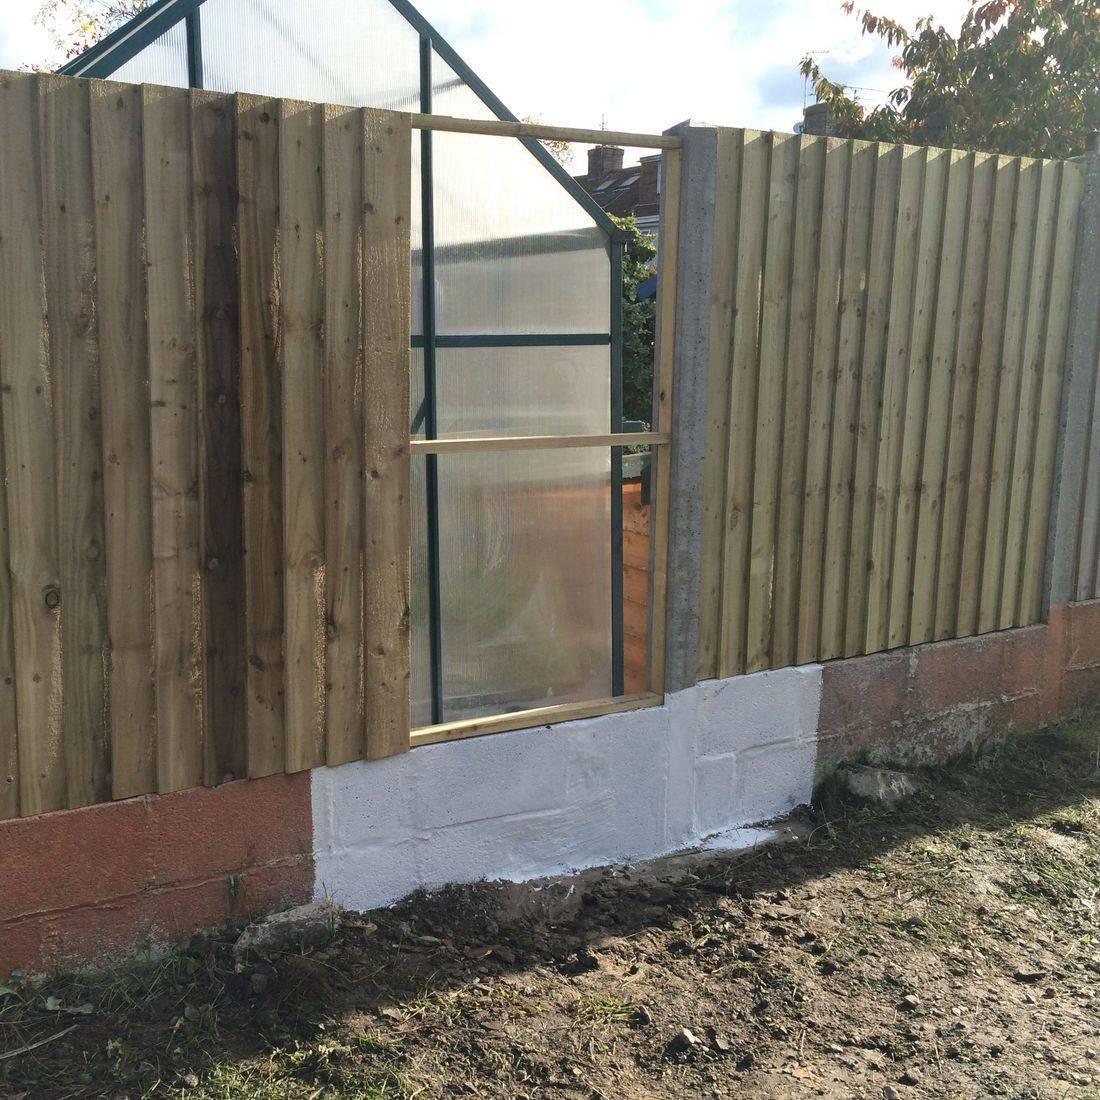 fence rapair bristol car damaged panel edge